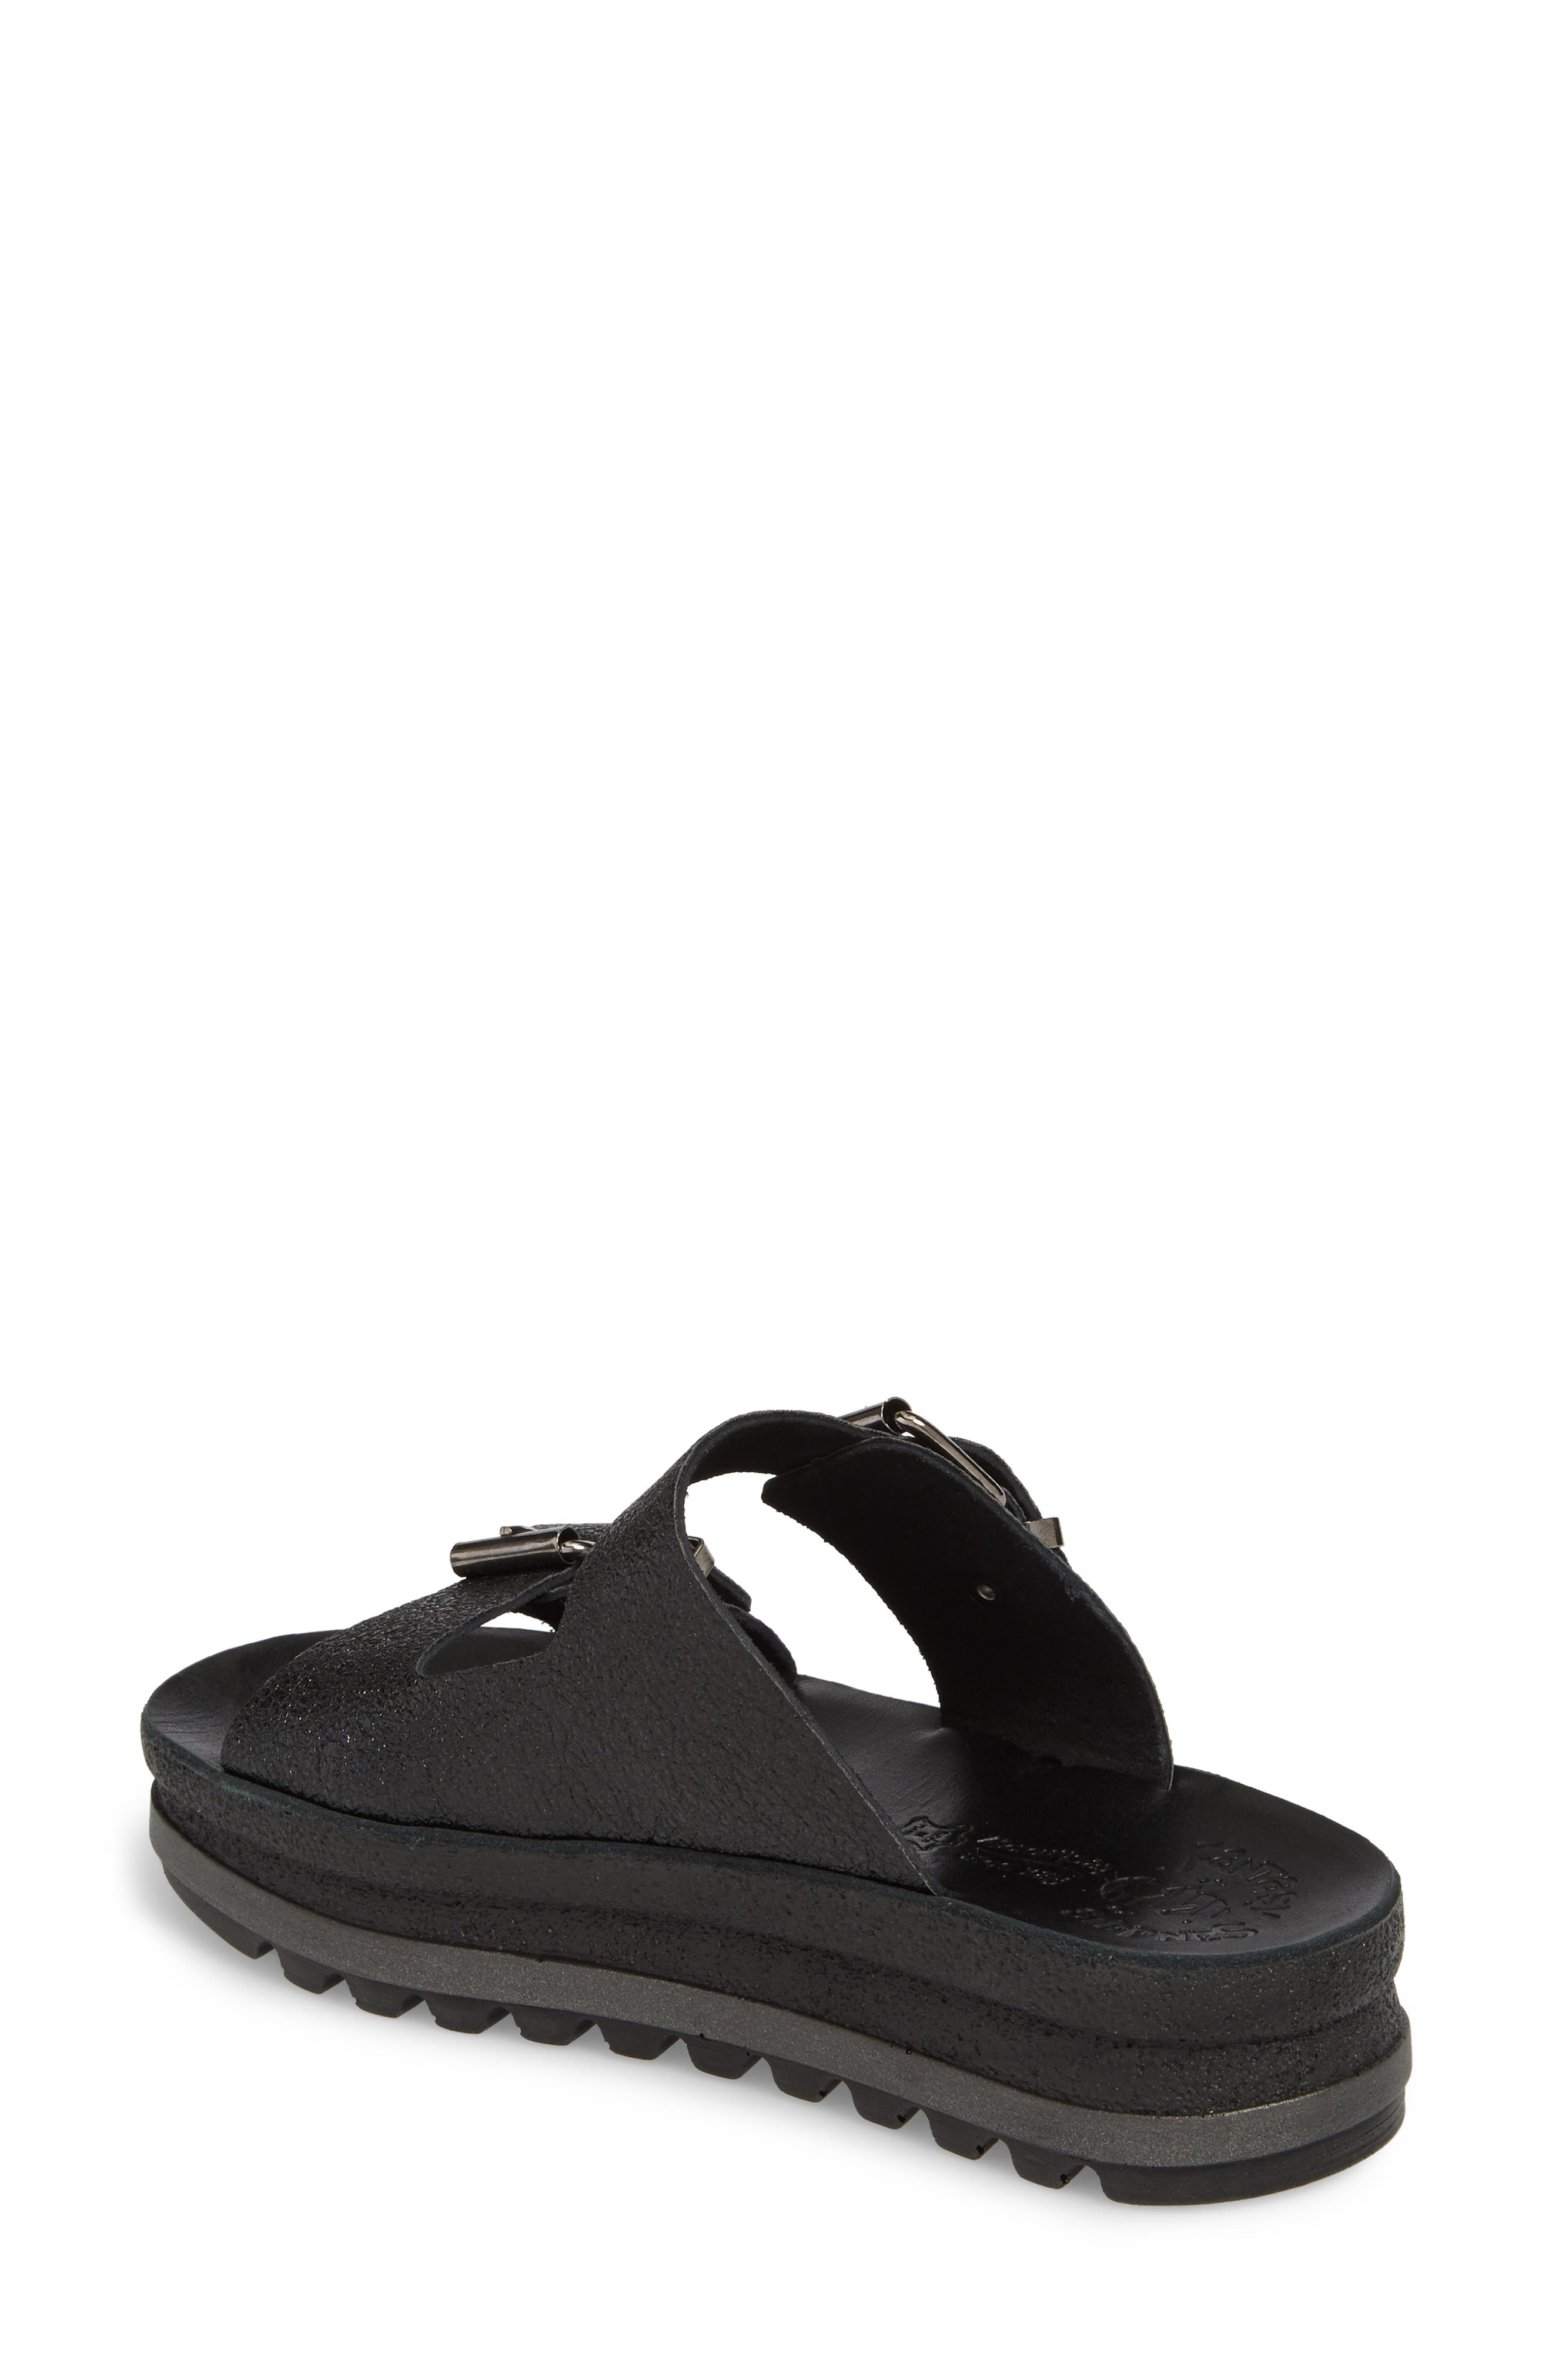 Melanie Platform Sandal,                             Alternate thumbnail 2, color,                             Black Spacey Leather